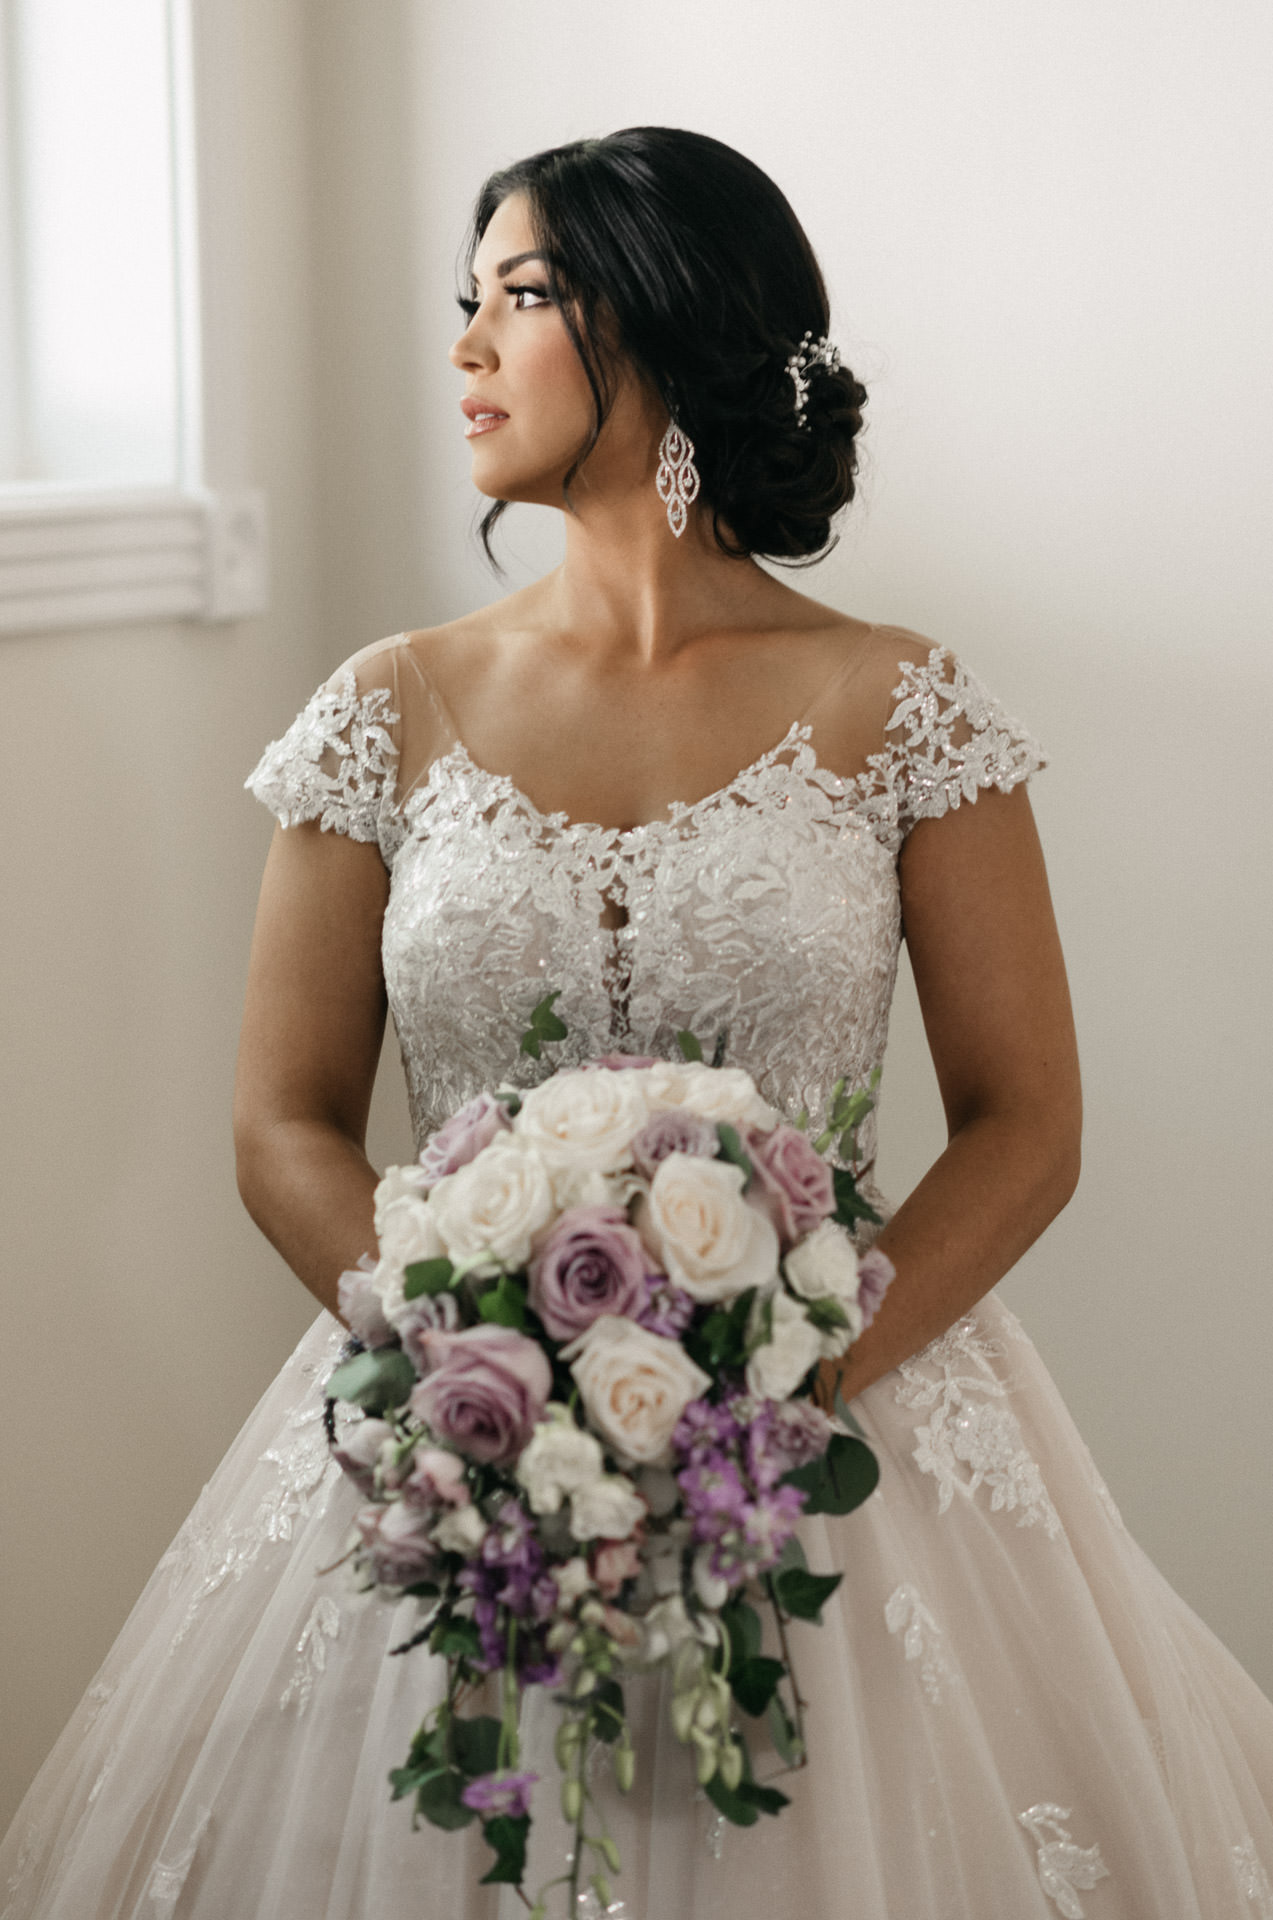 lexi-michael-wedding-blog-sm-30.jpg